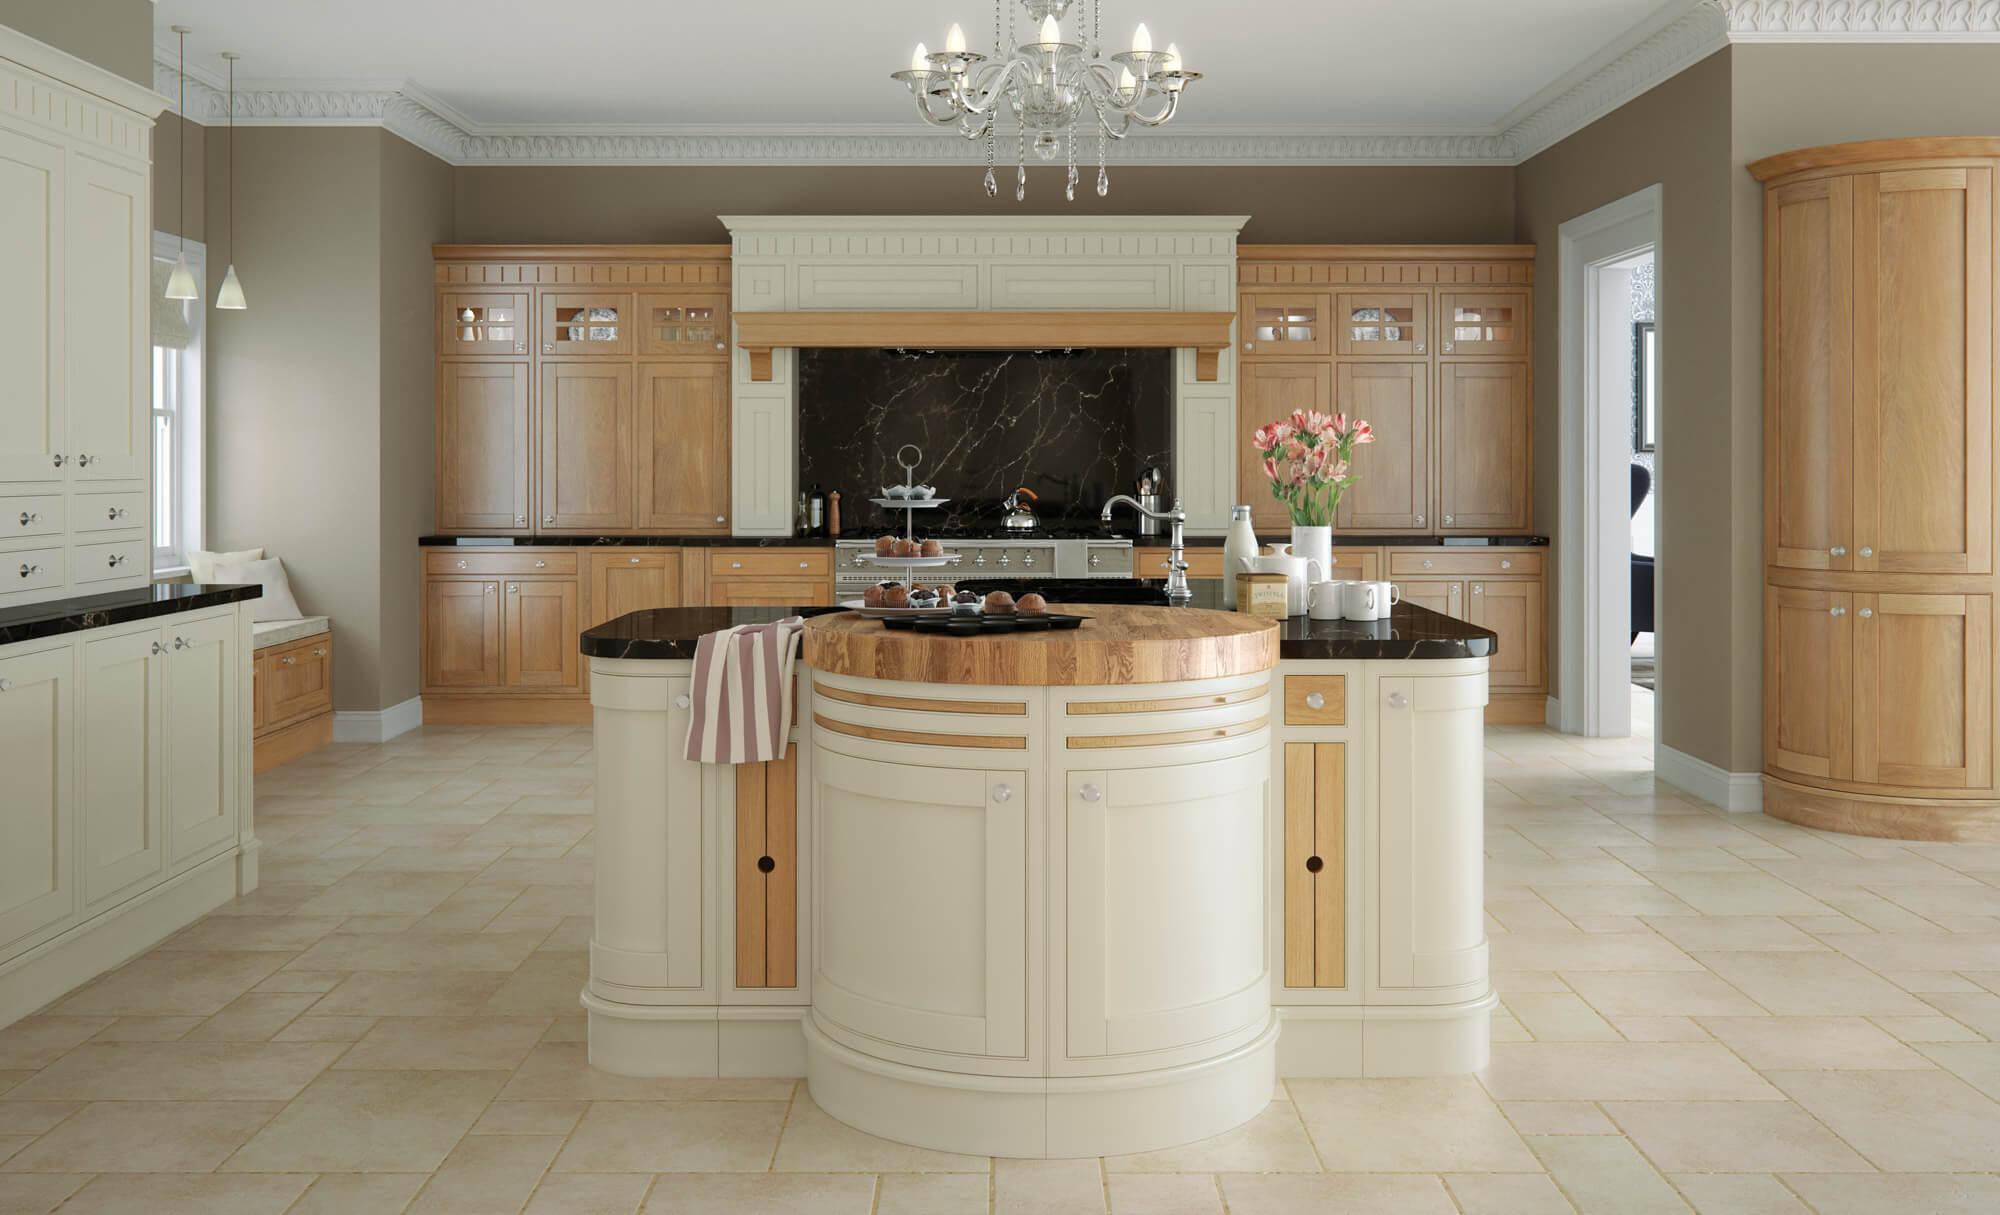 Montreal Kitchen White Oak Painted Cotton